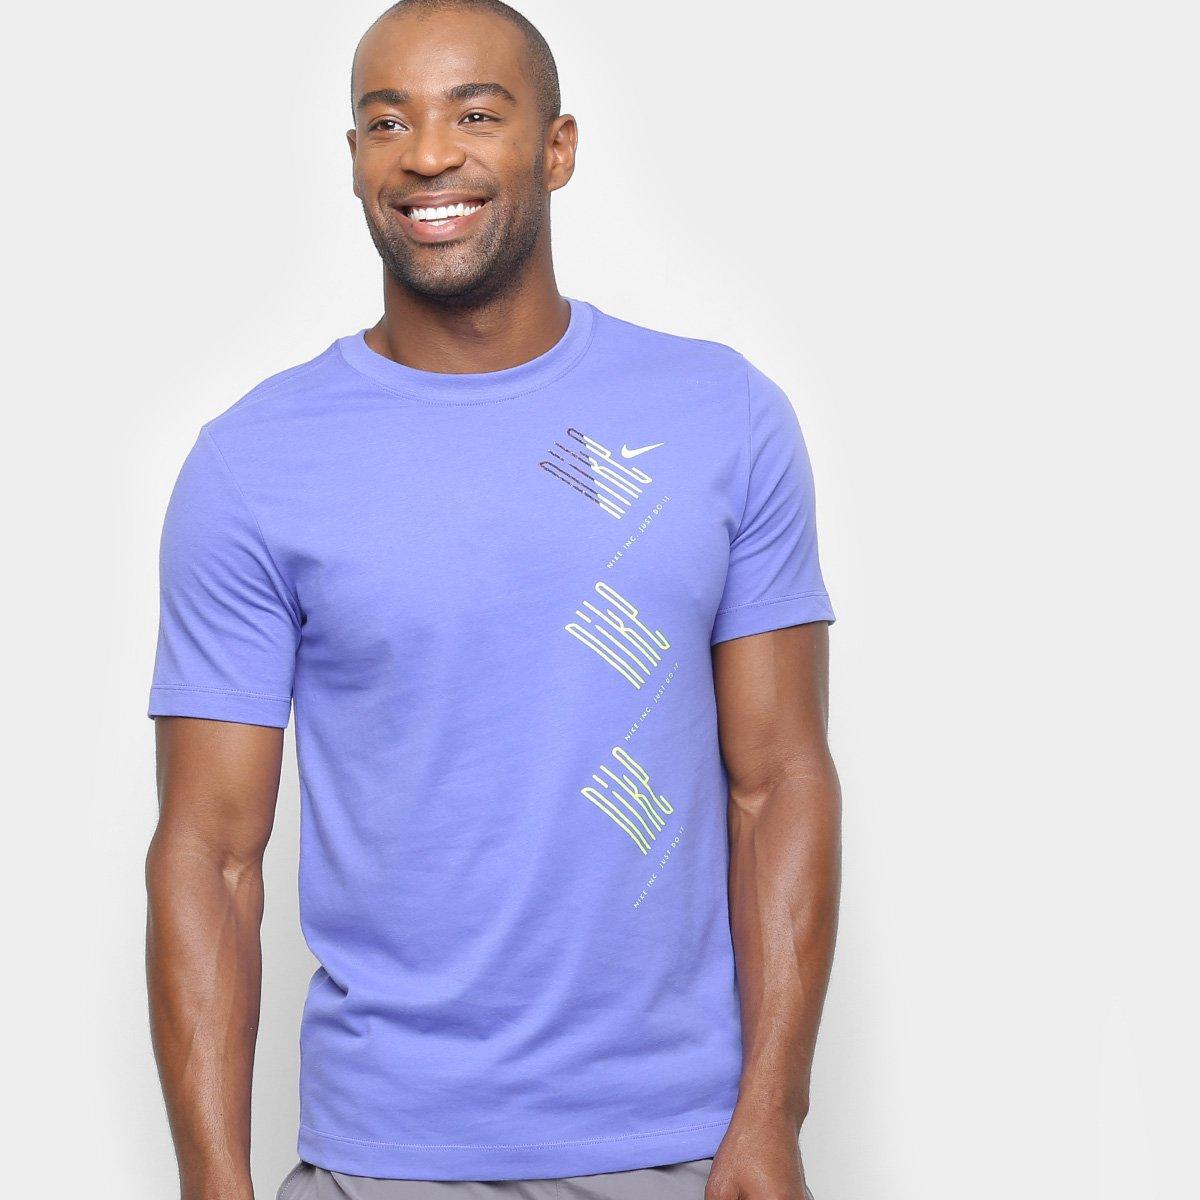 c6a678f208 FornecedorNetshoes. Camiseta Nike Dri-Fit Wild Run Masculina